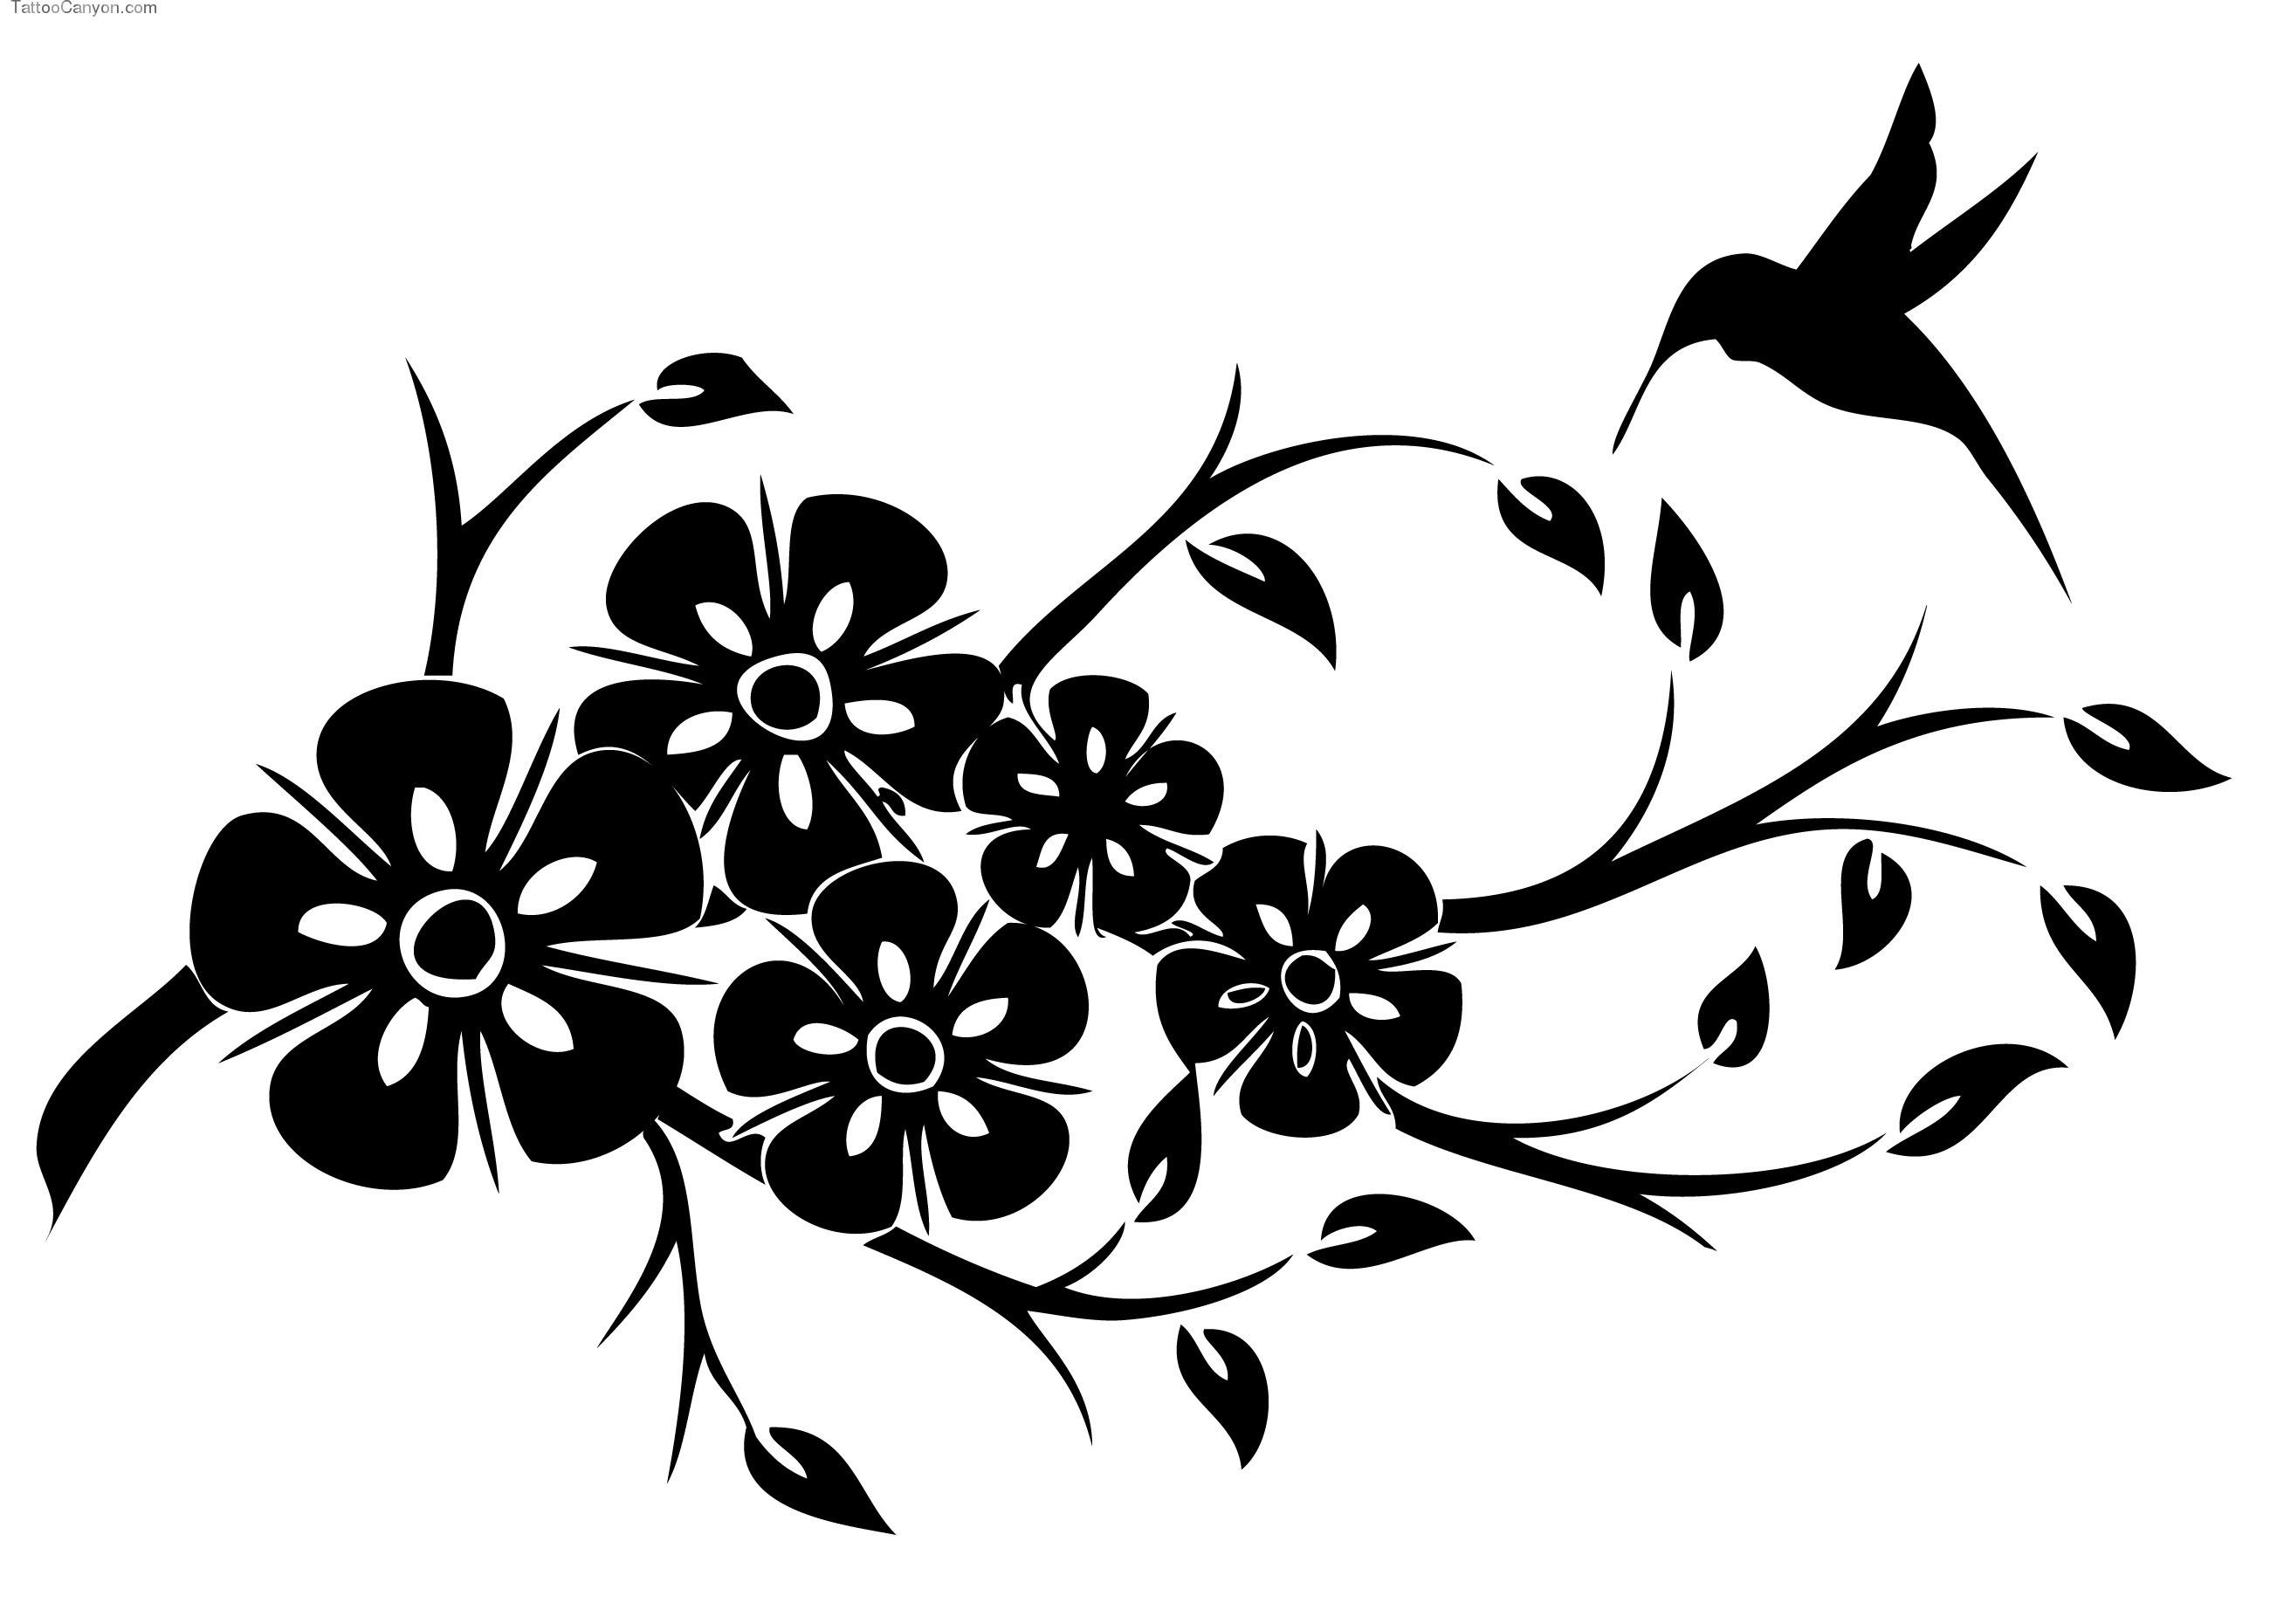 Трафареты для декора цветы